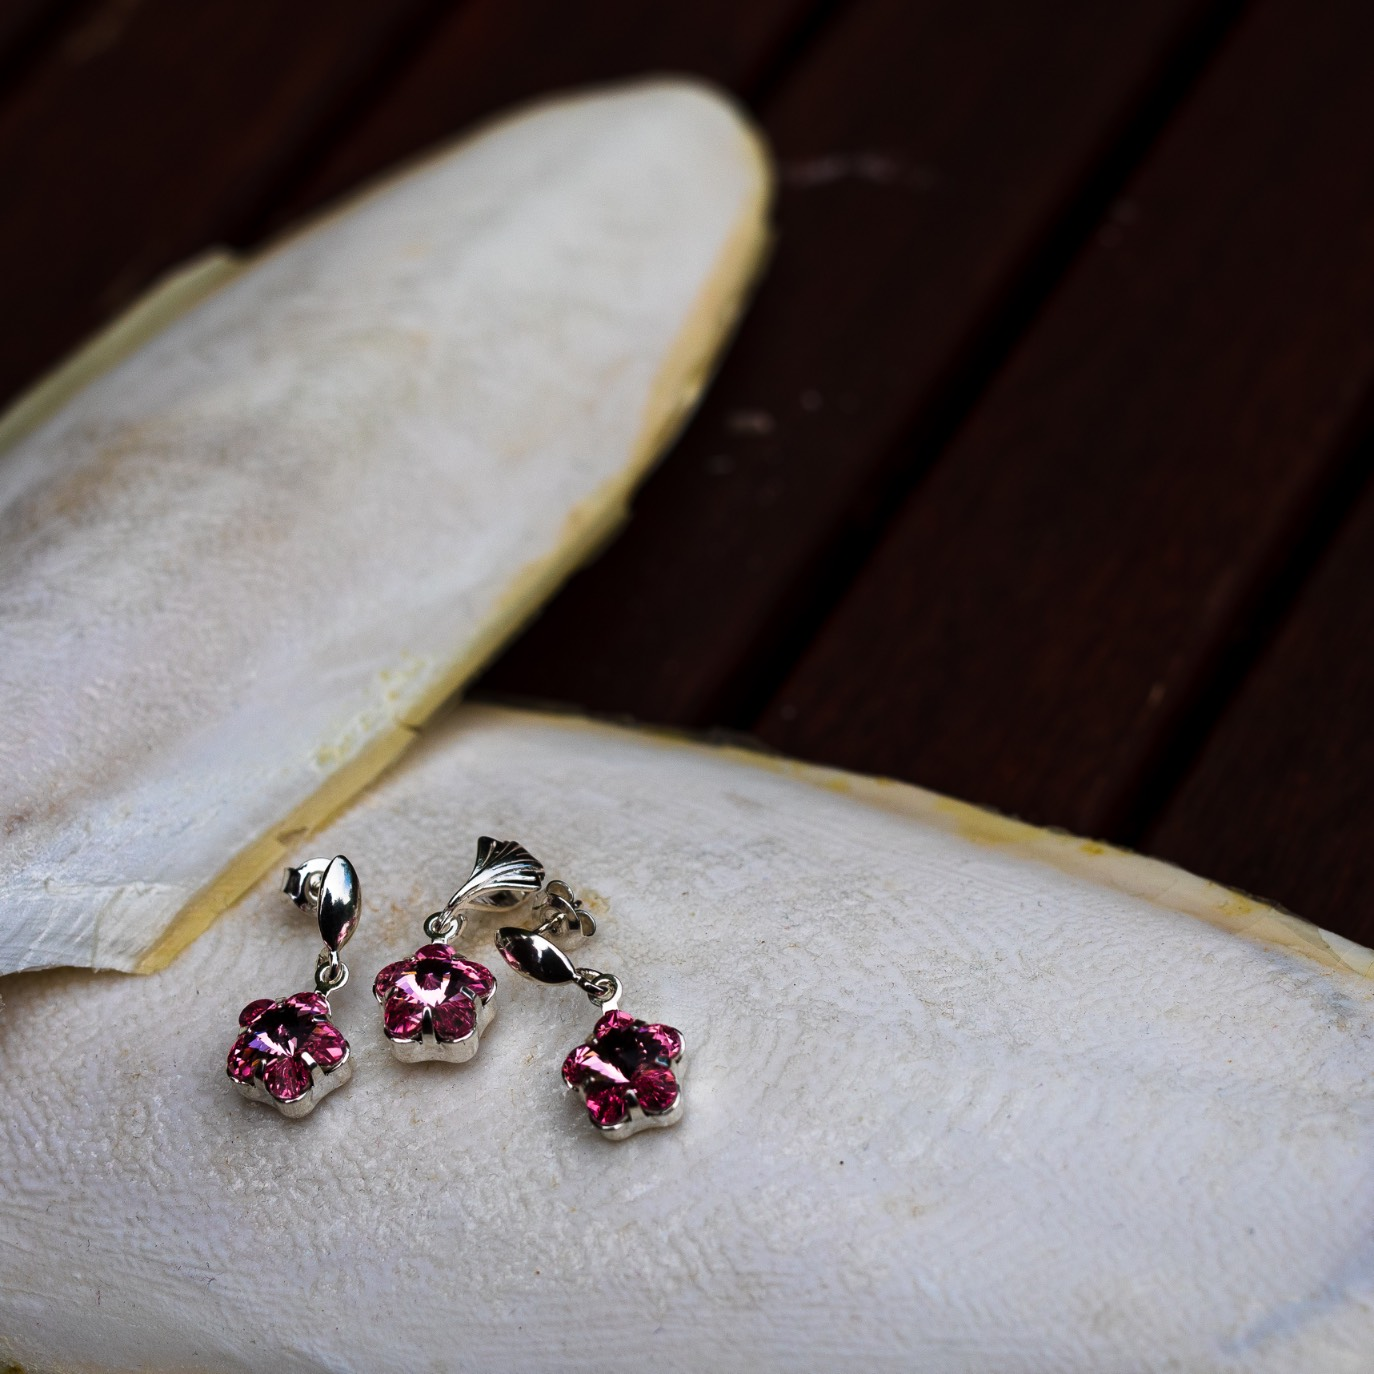 Reebou Handmade Jewellery